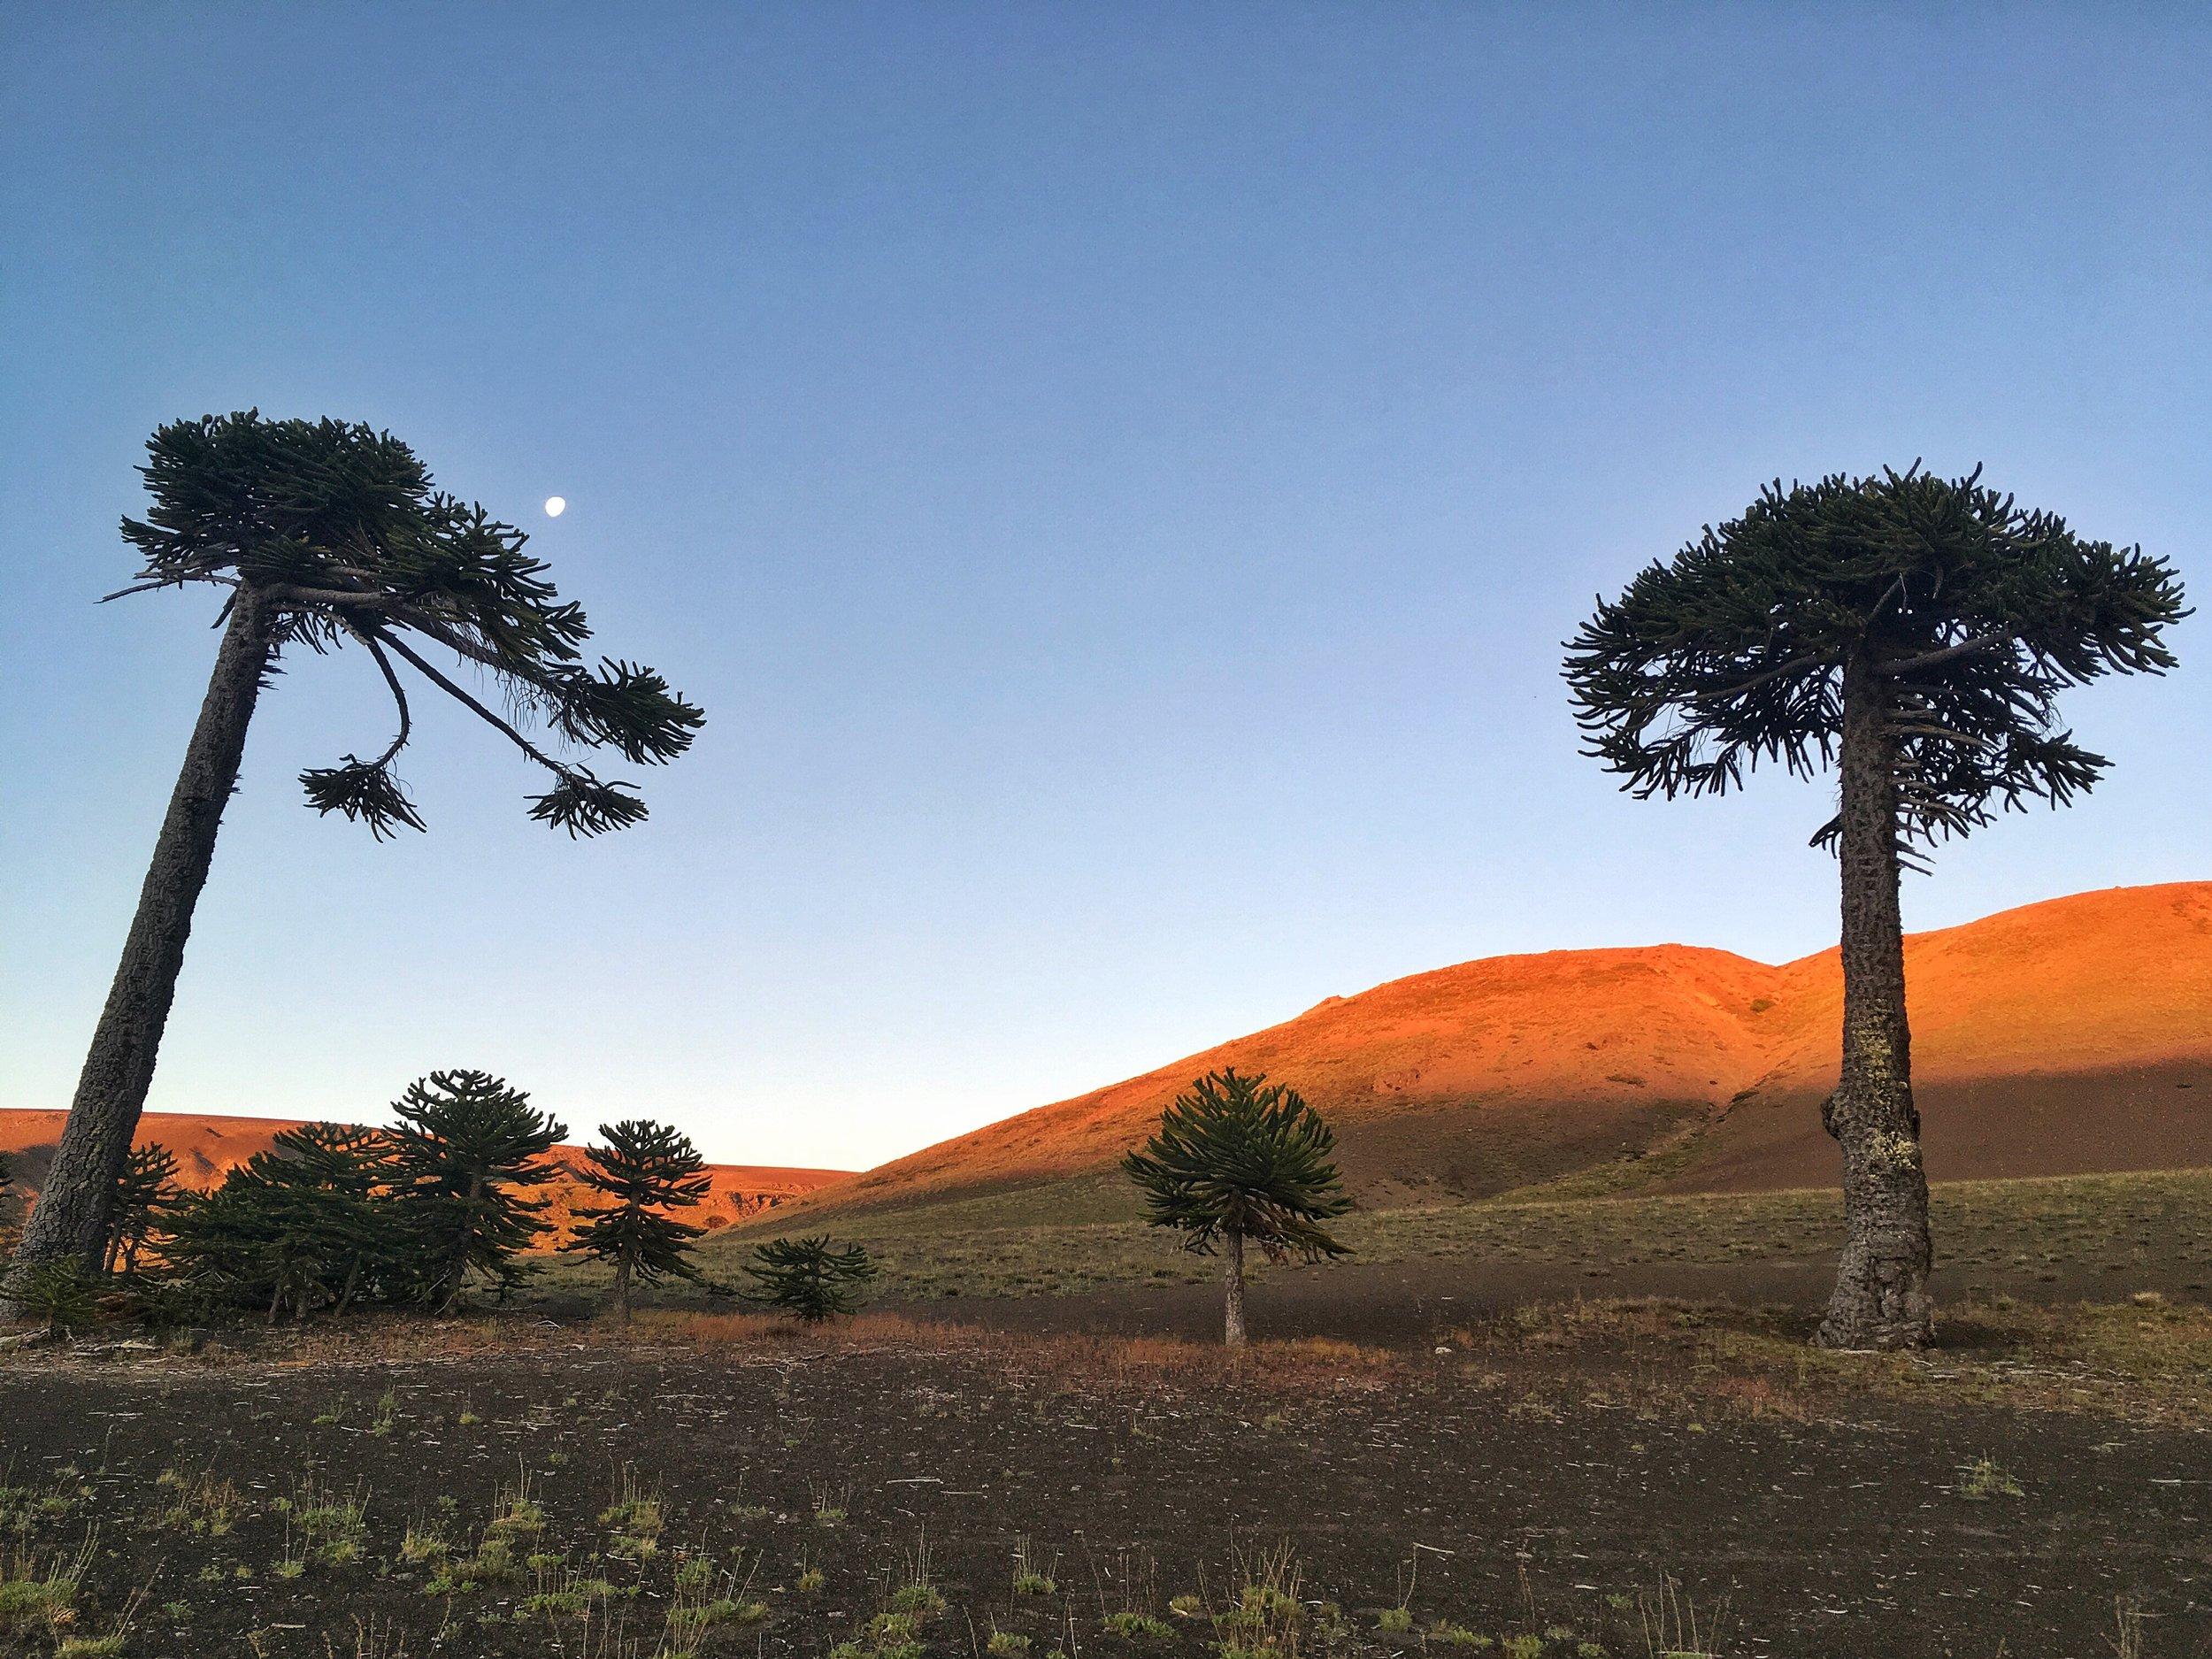 Araucaria araucanas standing tall at sunset